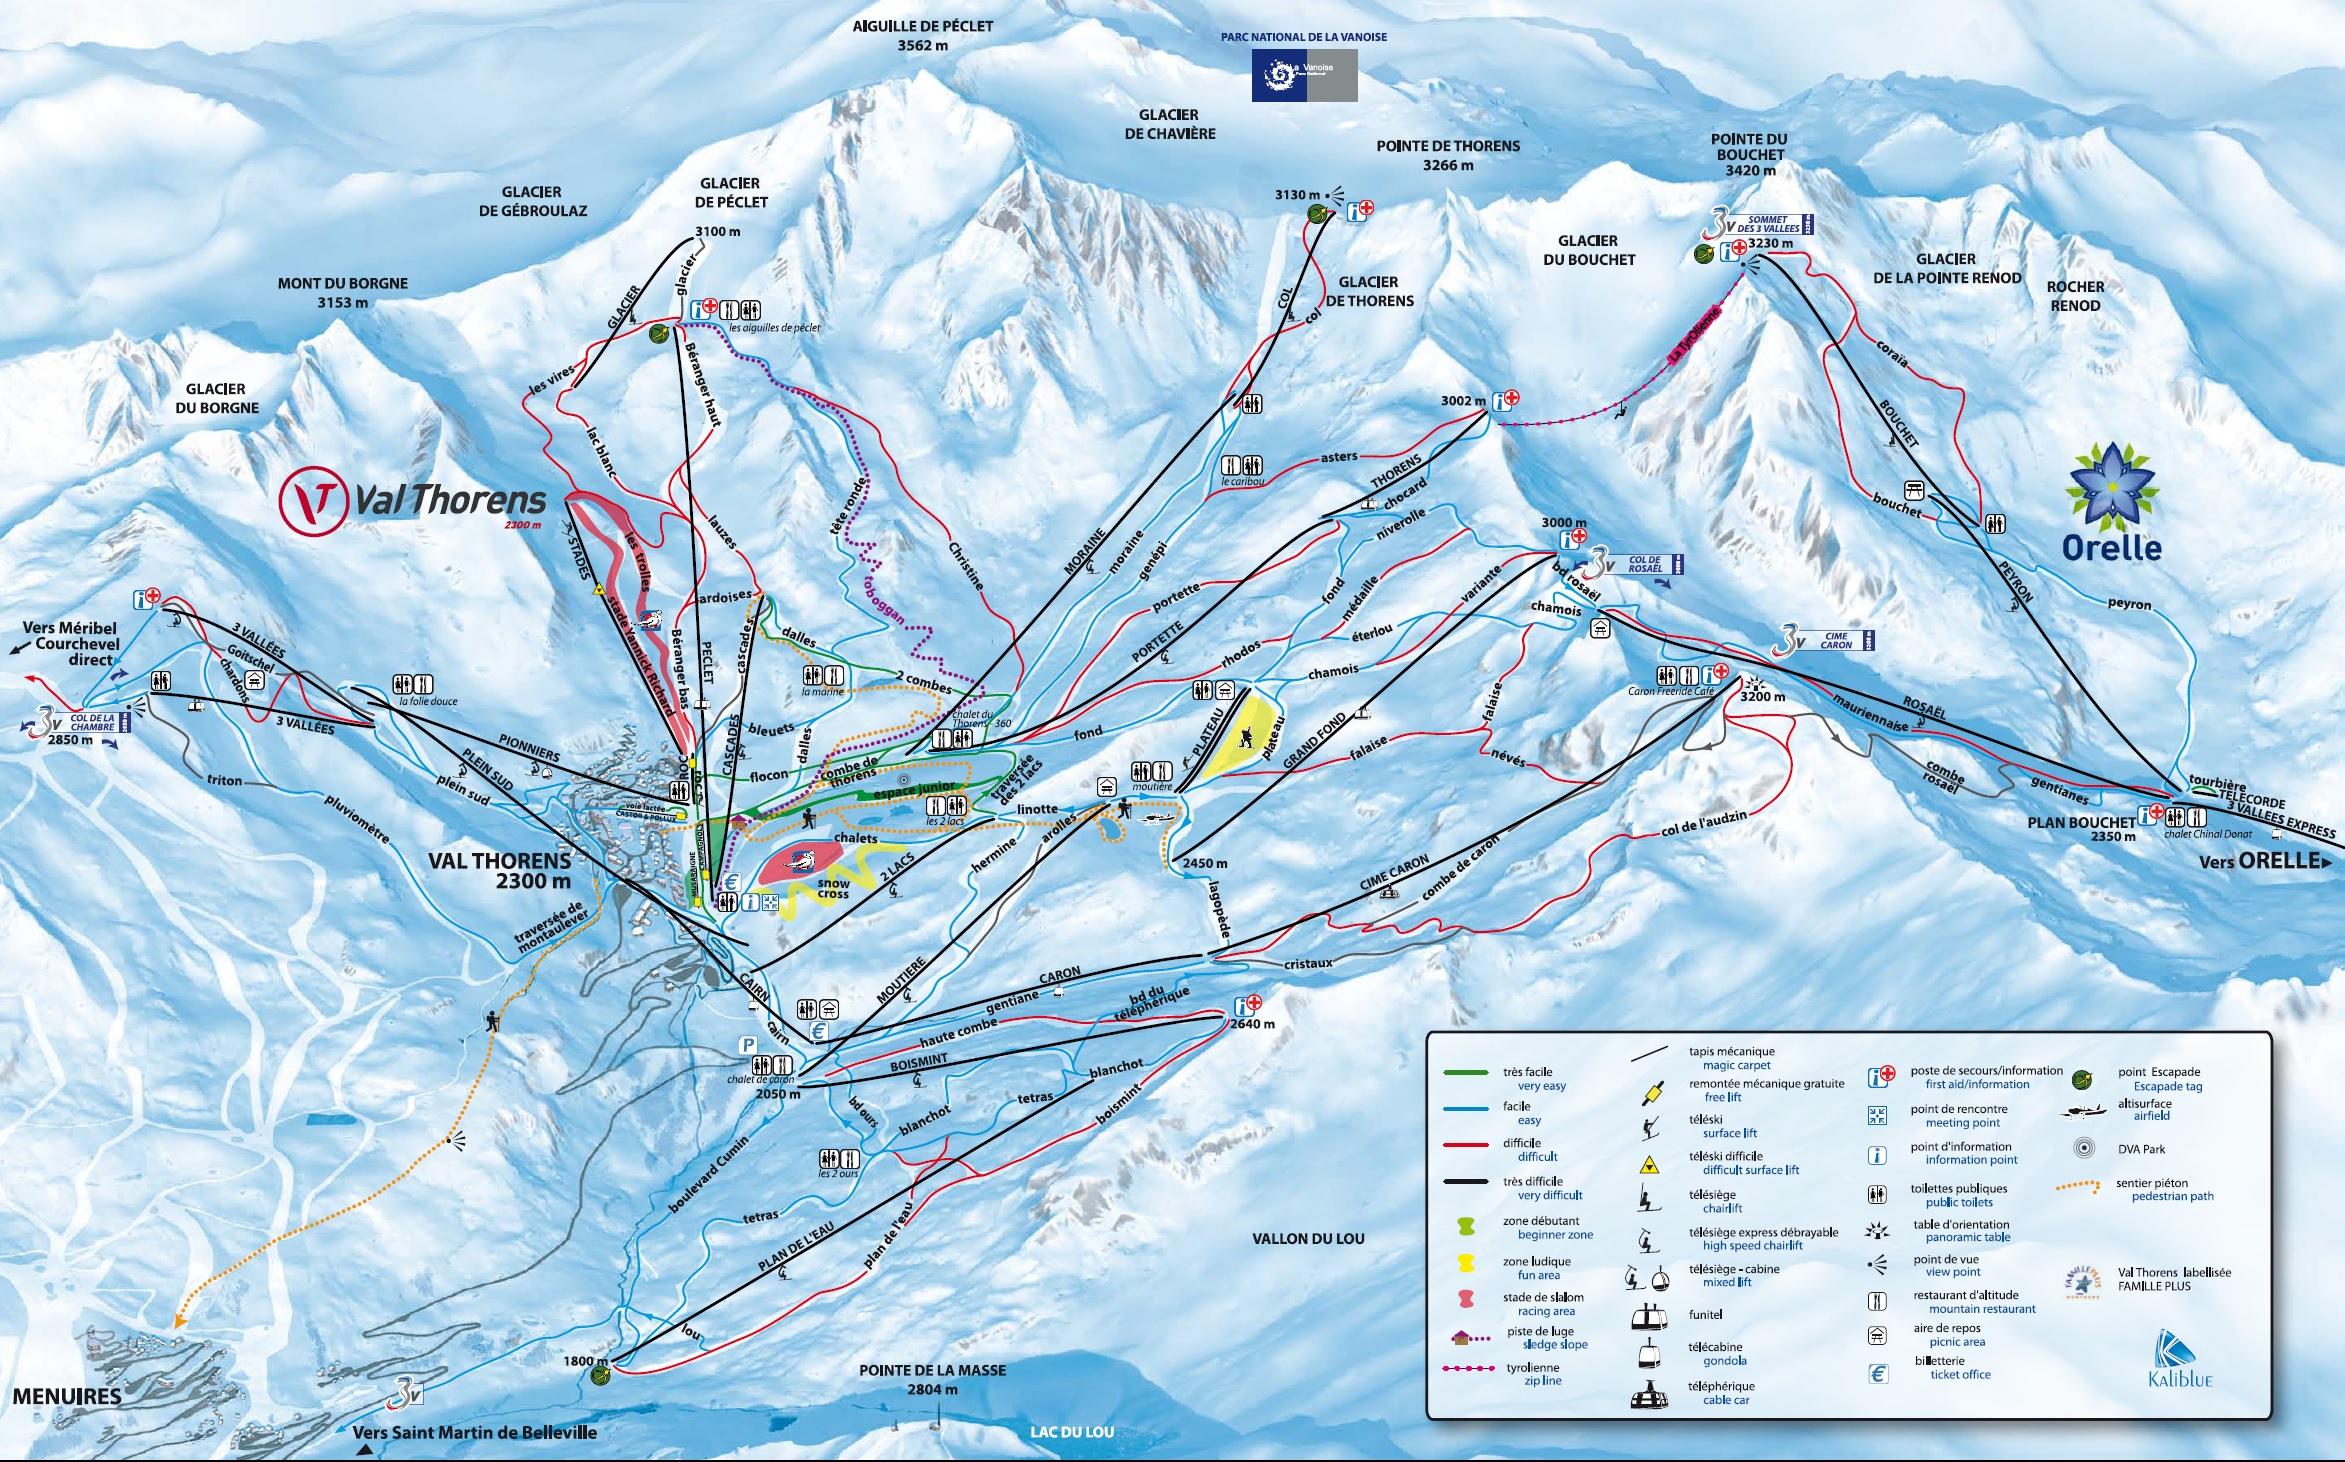 Trail map Les 3 Valles Val ThorensLes MenuiresMribelCourchevel